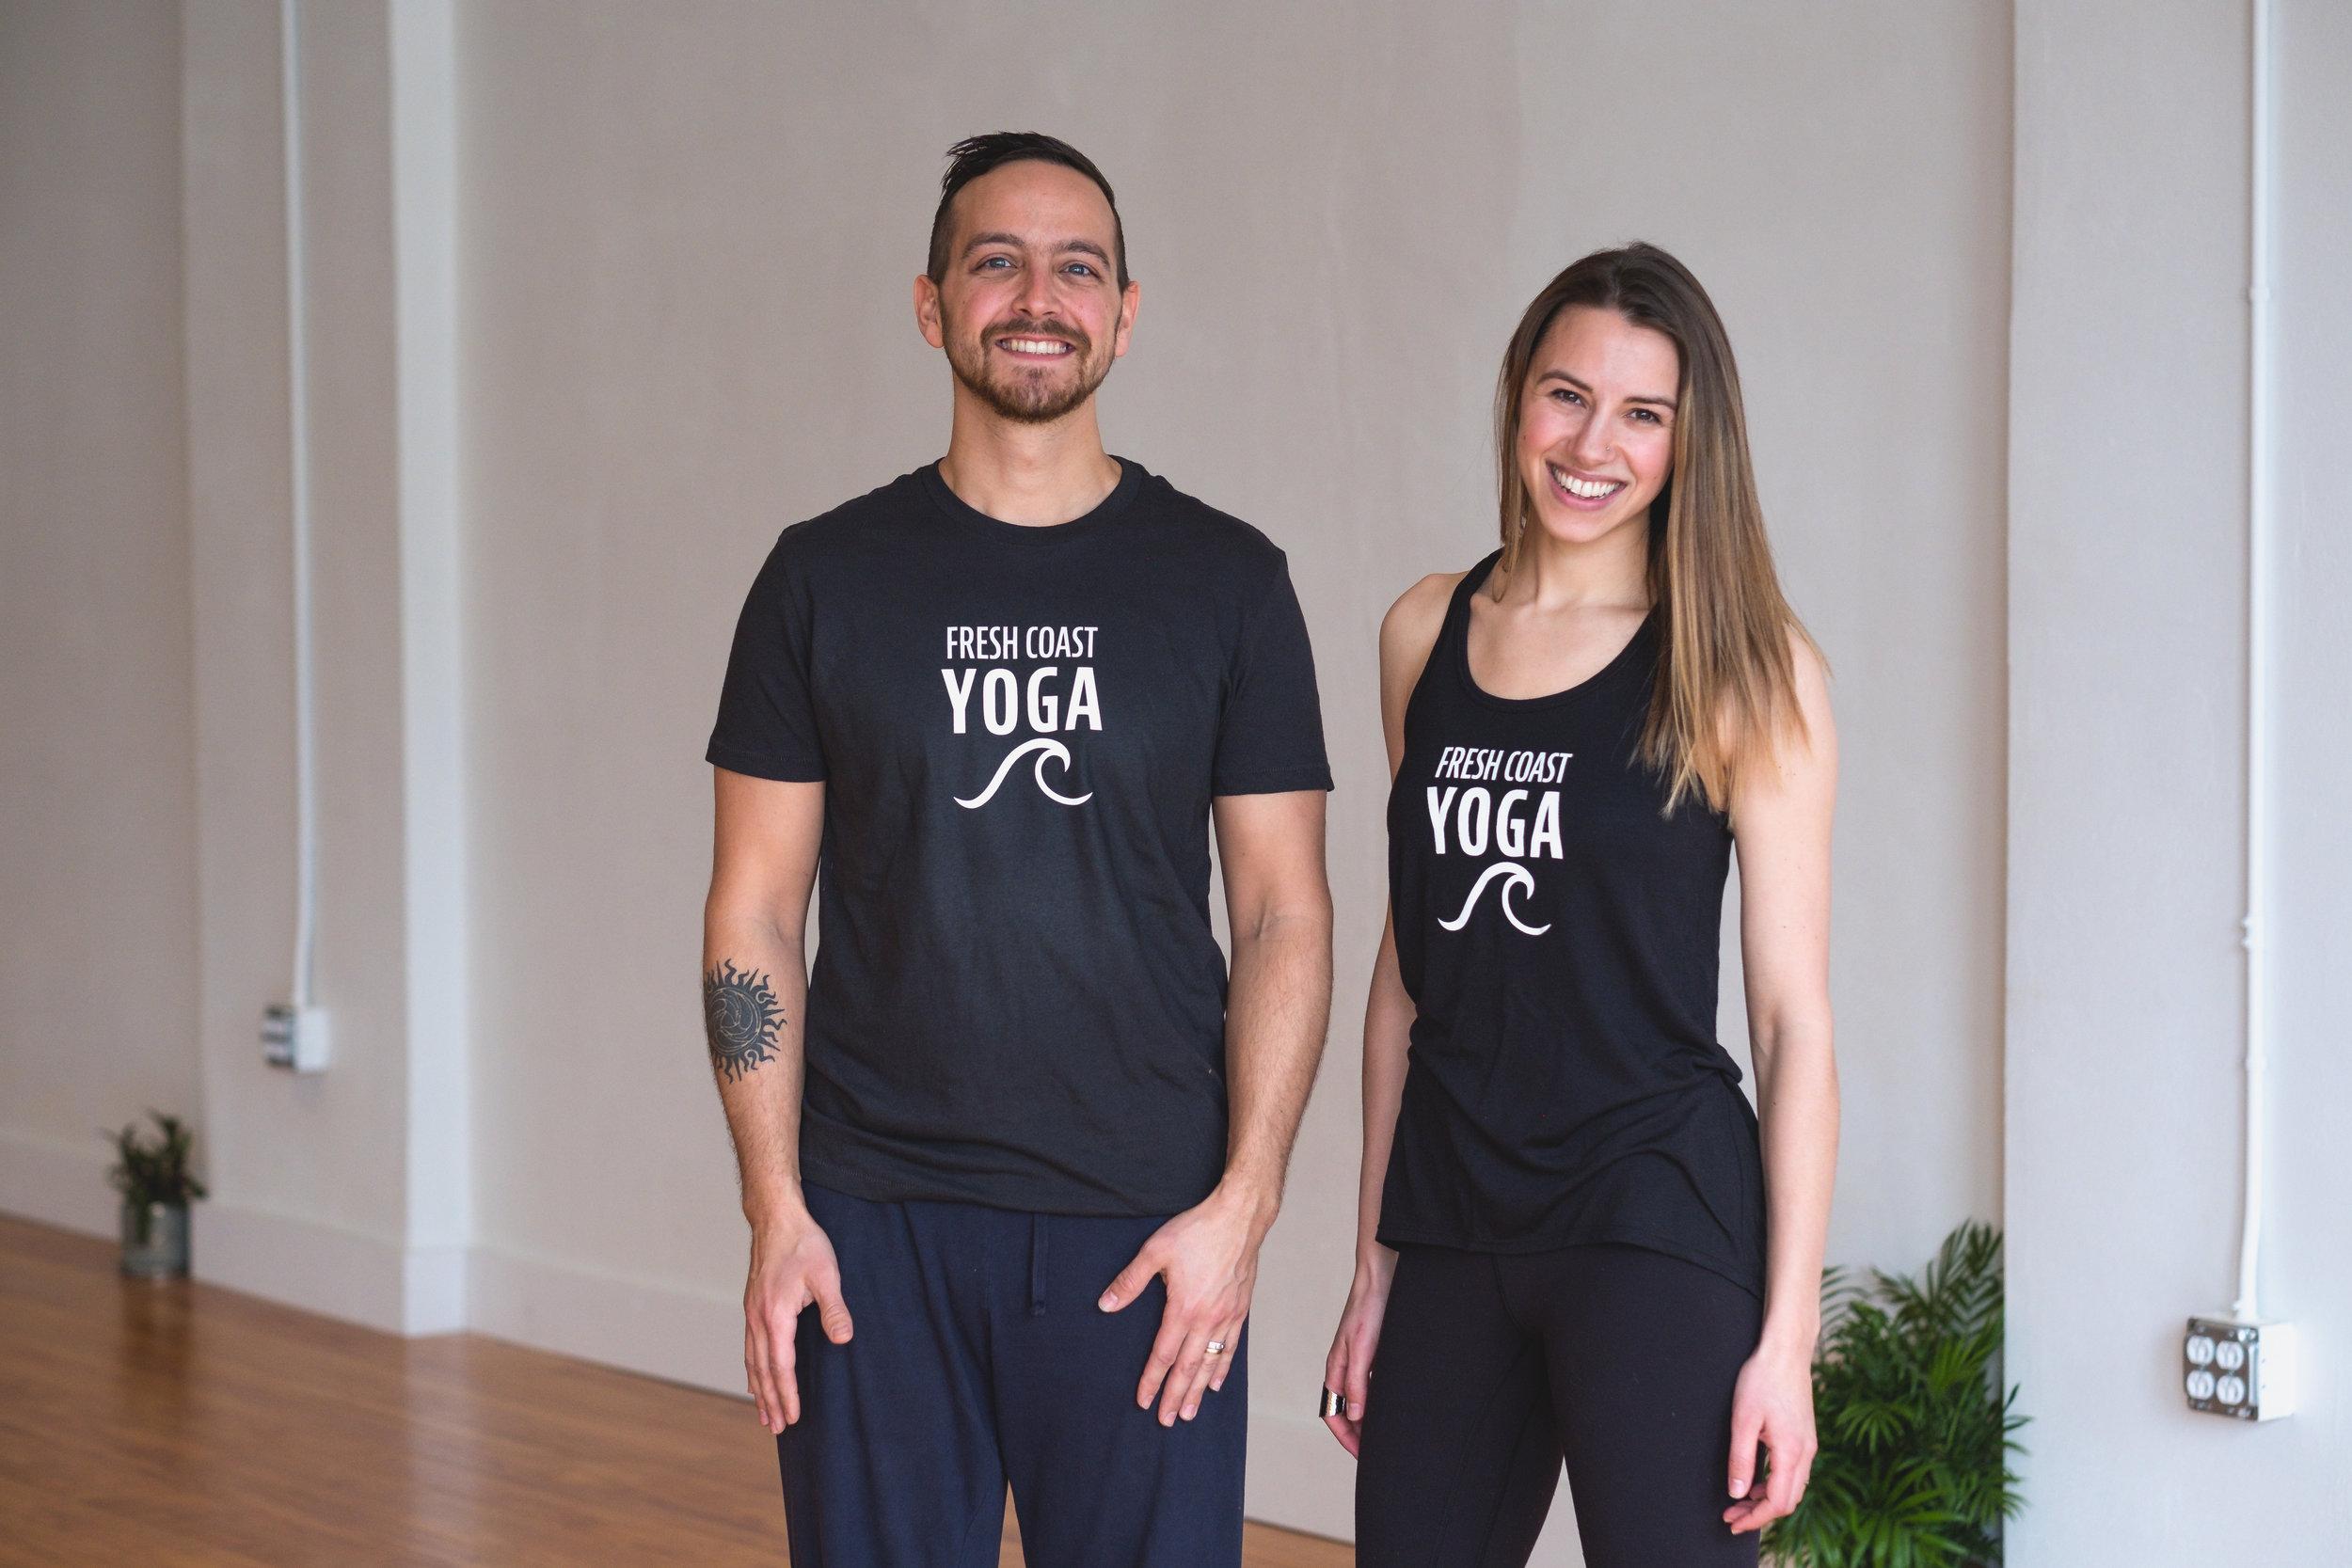 Fresh Coast Yoga Houghton Mary and Drew.jpg